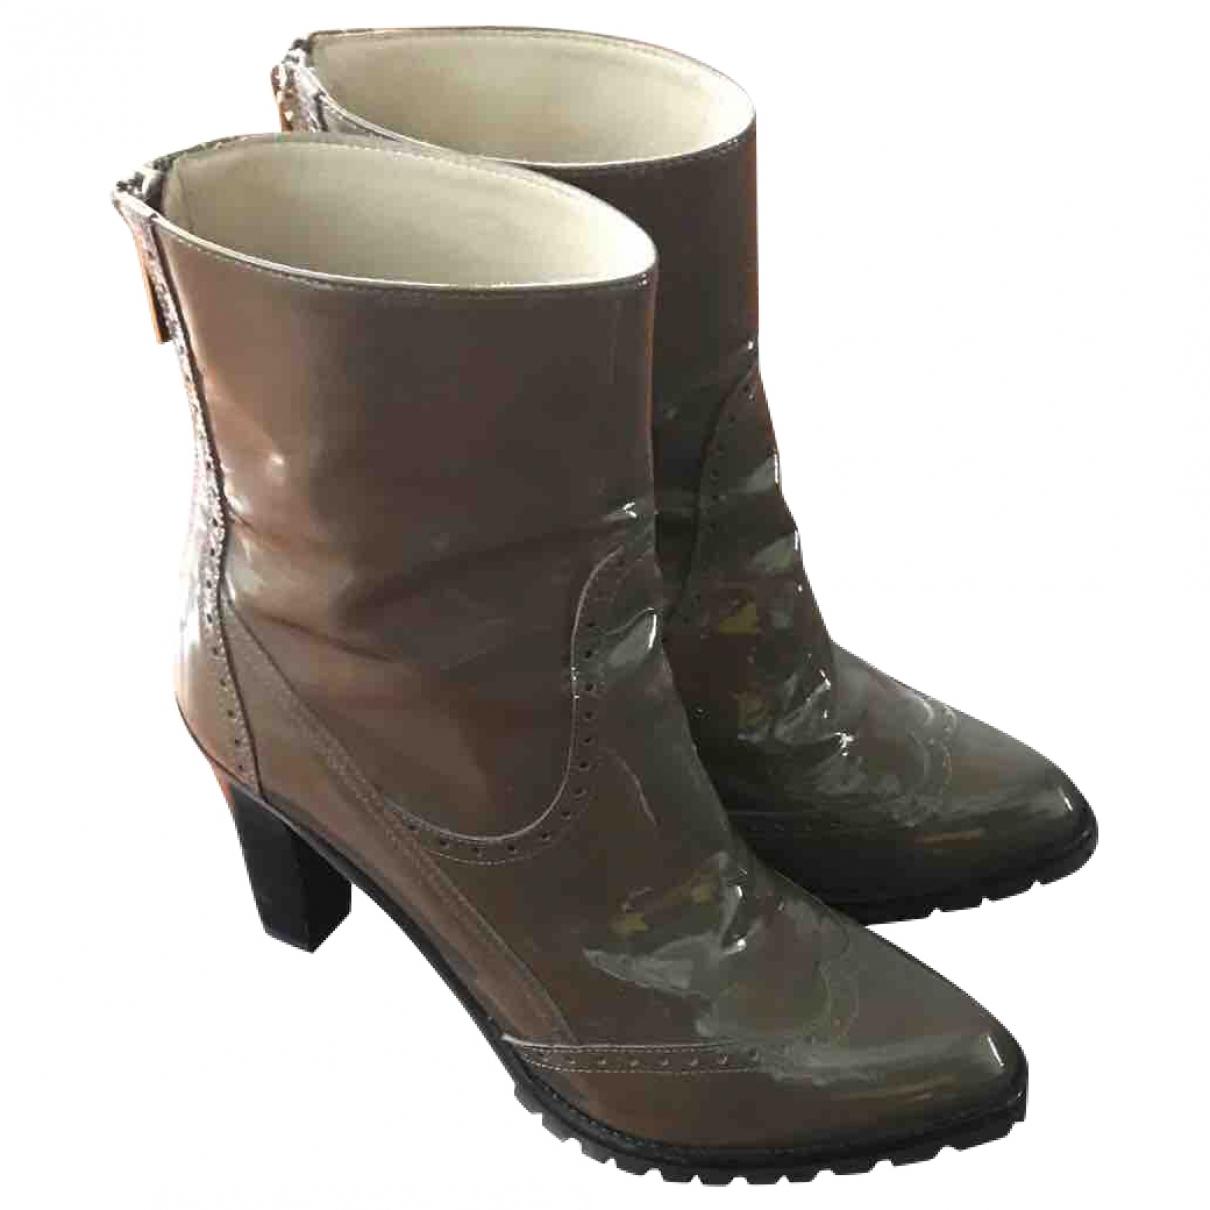 Fratelli Rossetti - Boots   pour femme en cuir verni - kaki